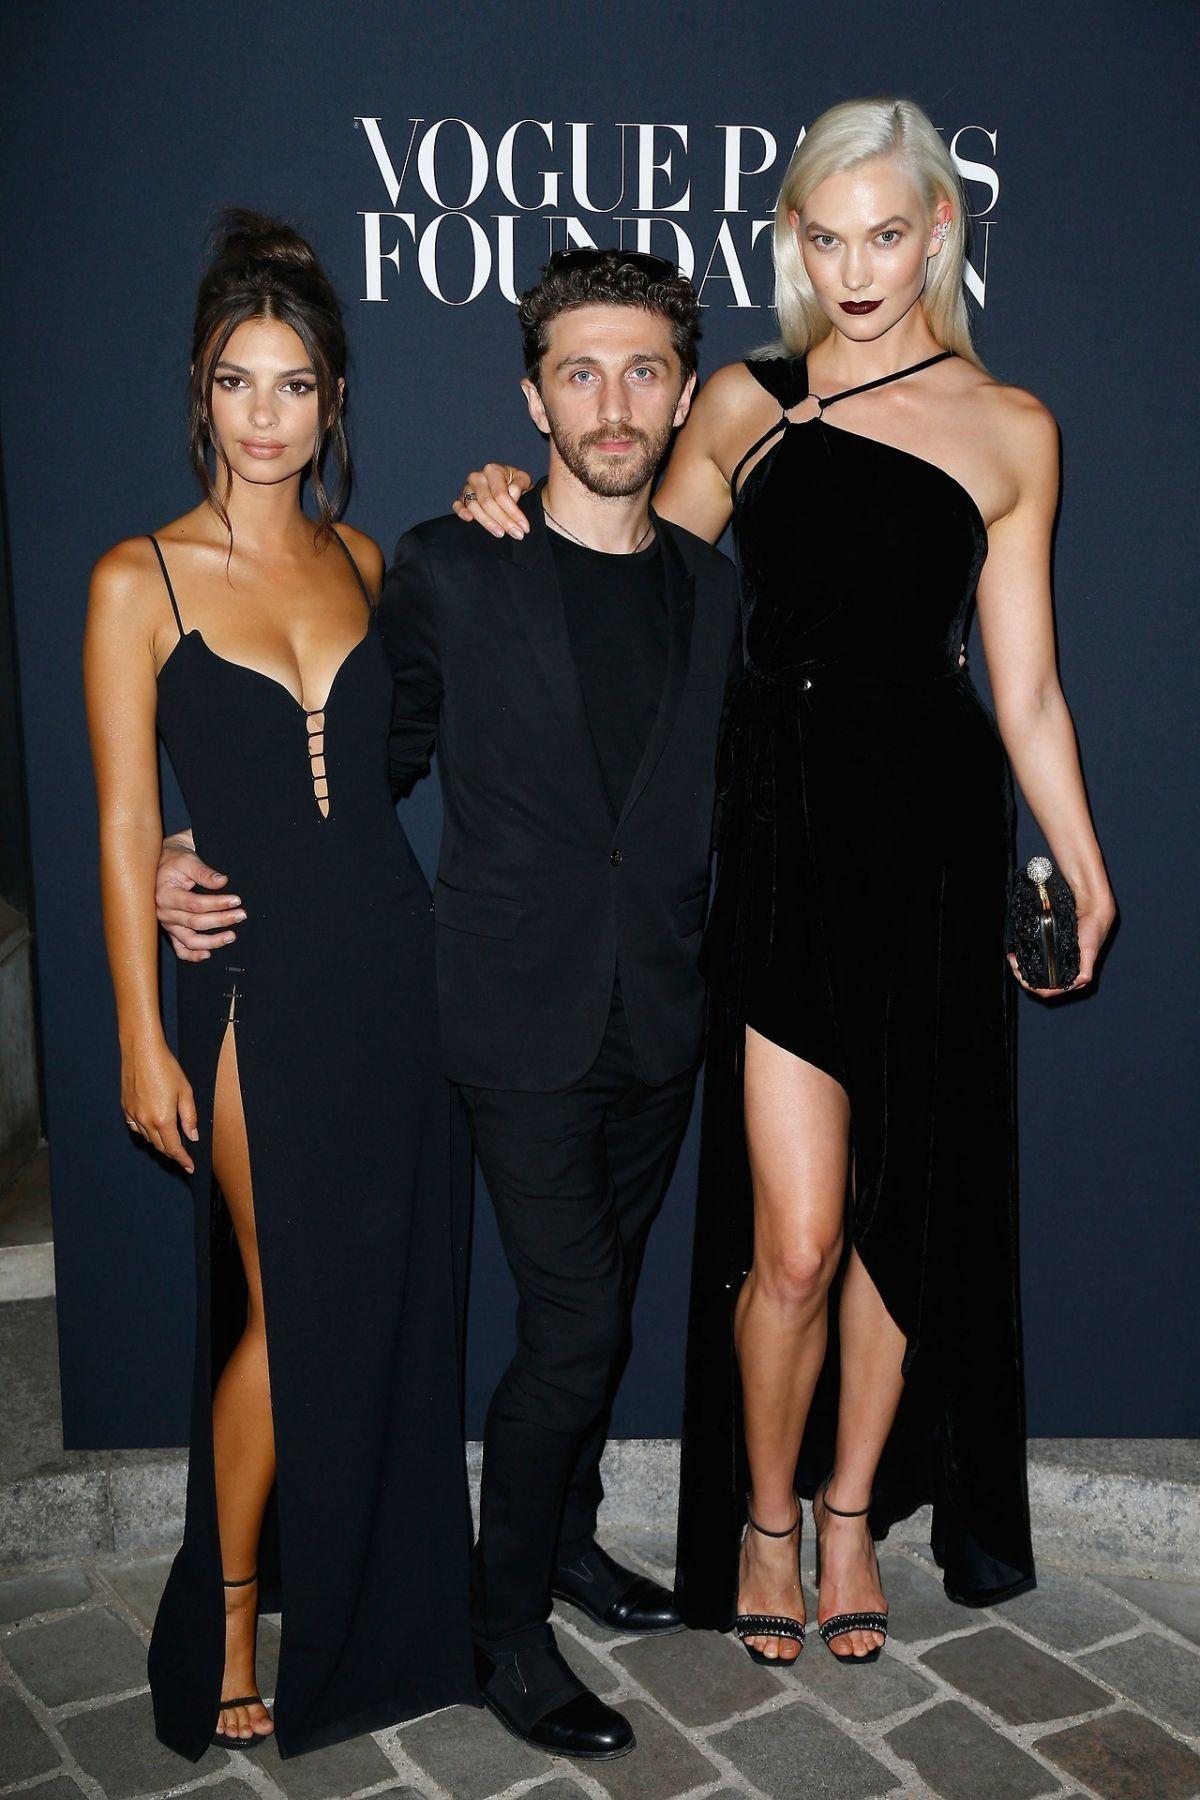 EMILY RATAJKOWSKI and KARLIE KLOSS at Vogue Foundation Dinner in Paris 07/4/2017